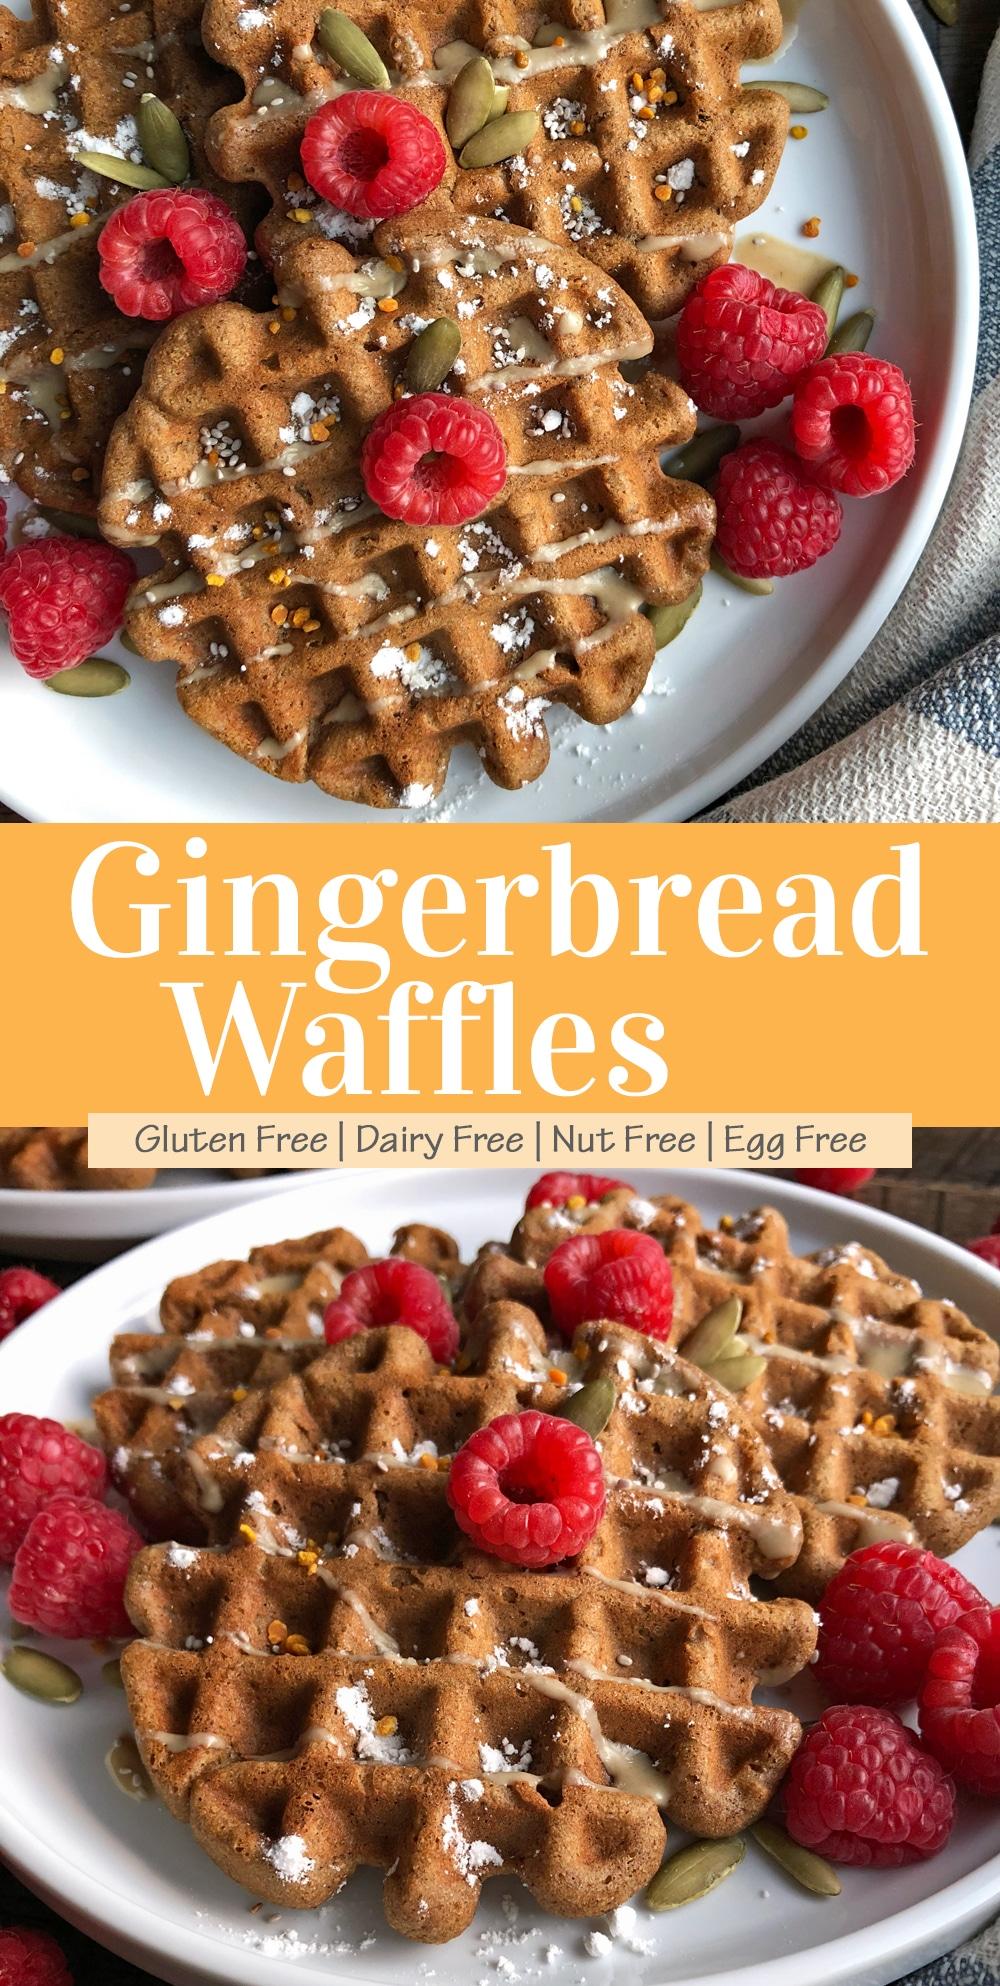 paleo-vegan-gingerbread-waffle-recipe-pinterest-image